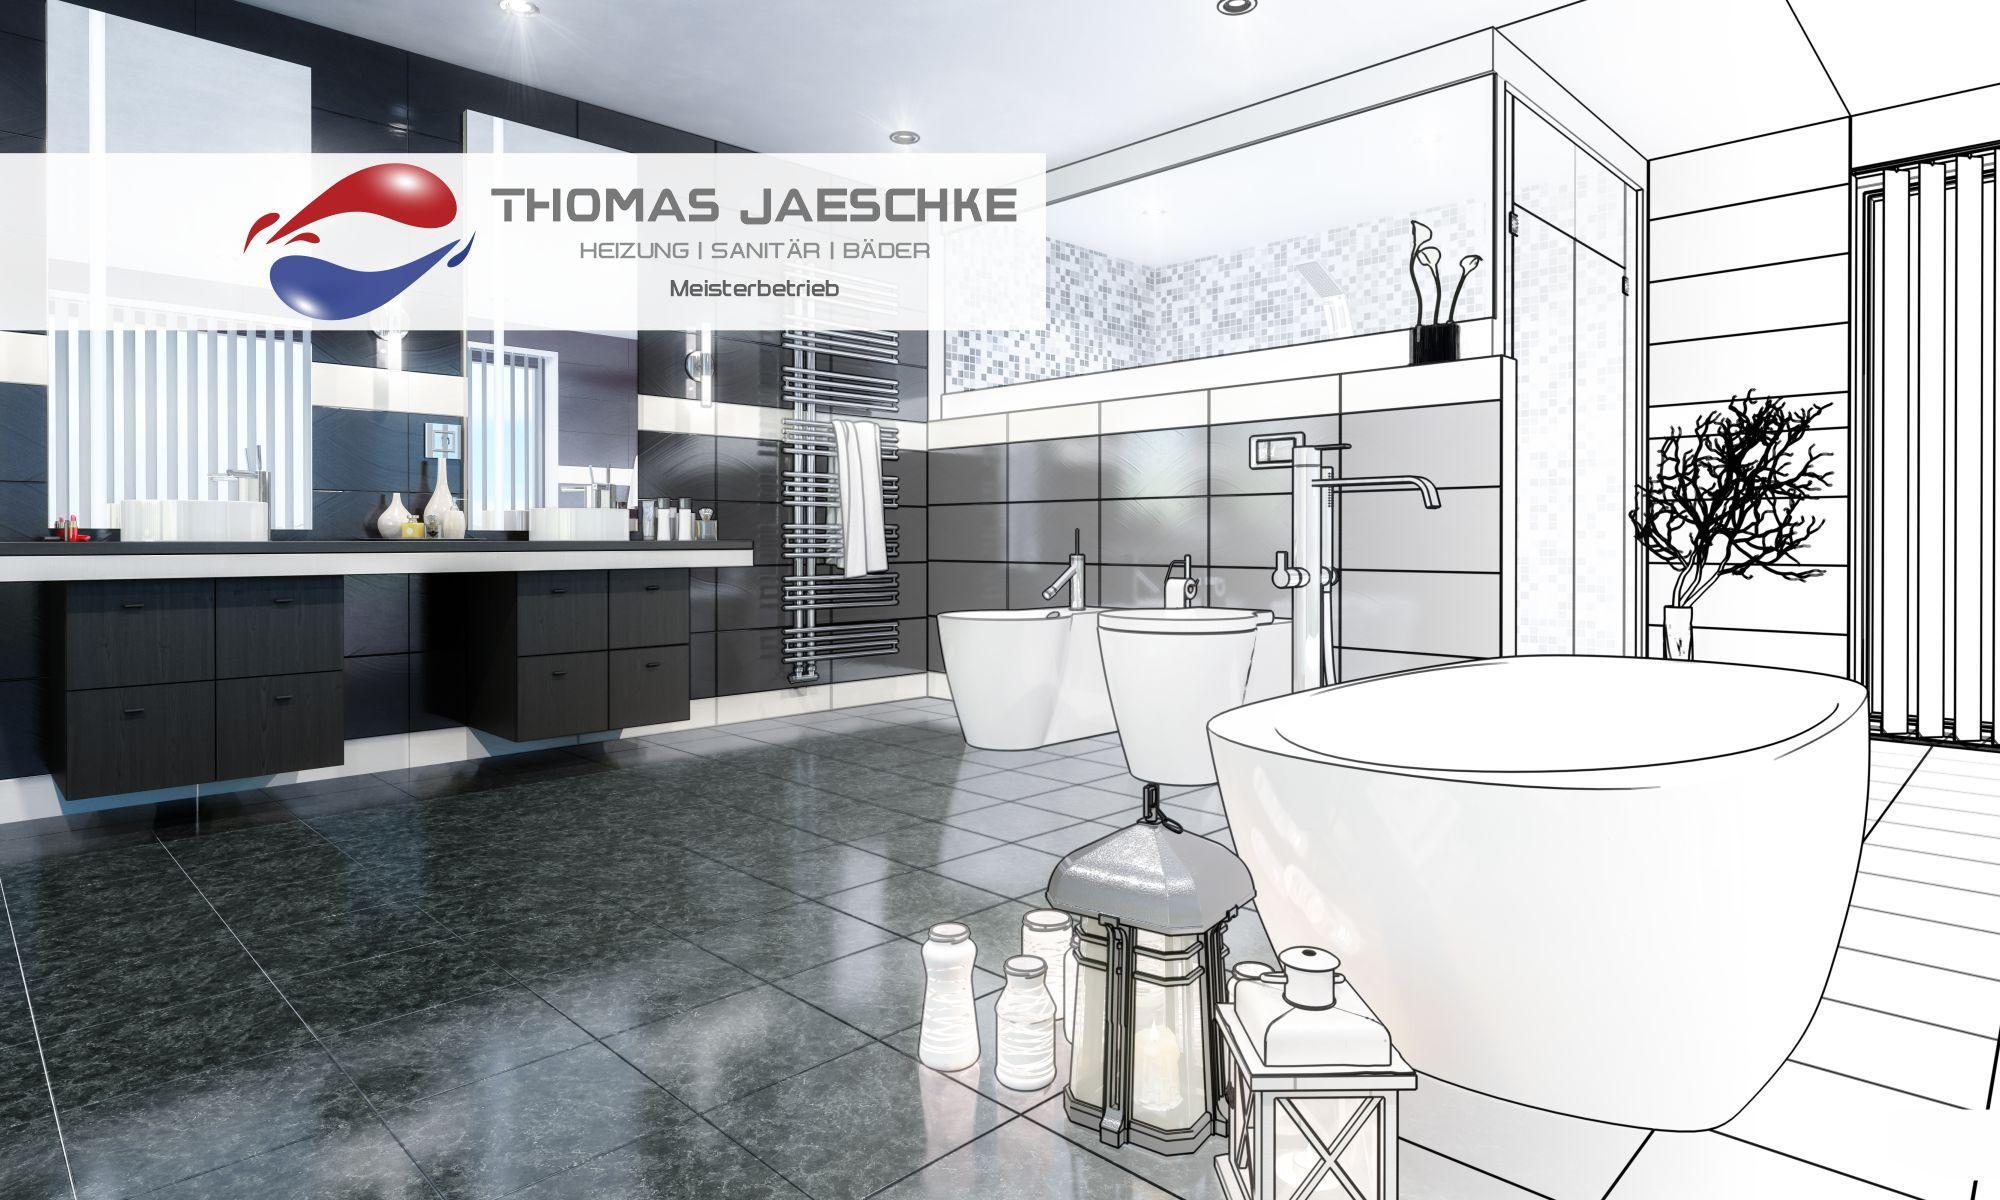 Jaeschke Badgestaltung